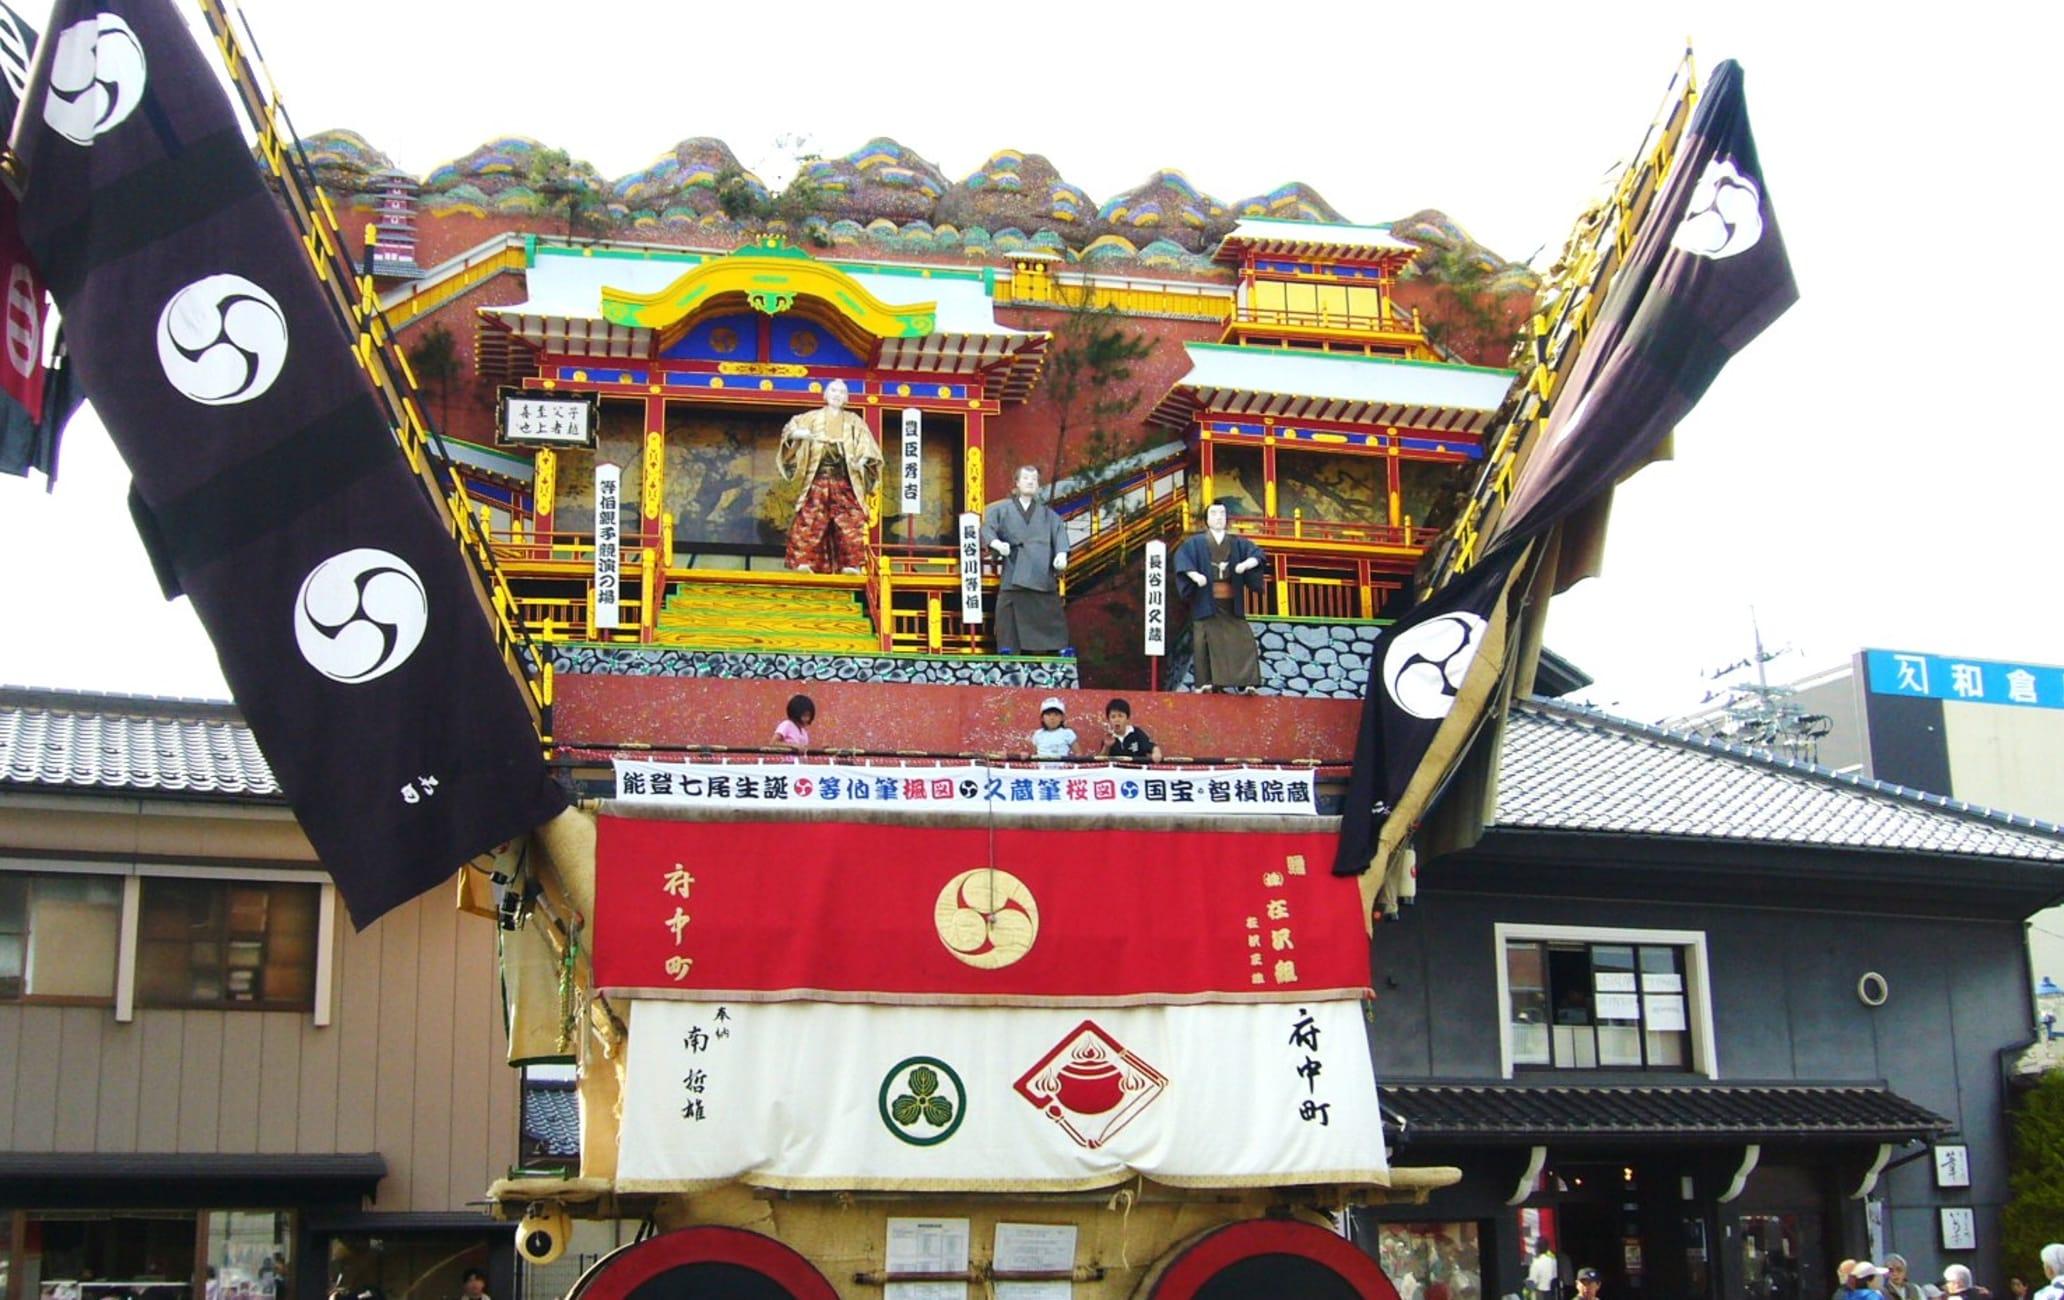 DEKAYAMA Giant Mountains The largest floats of Japan's festival